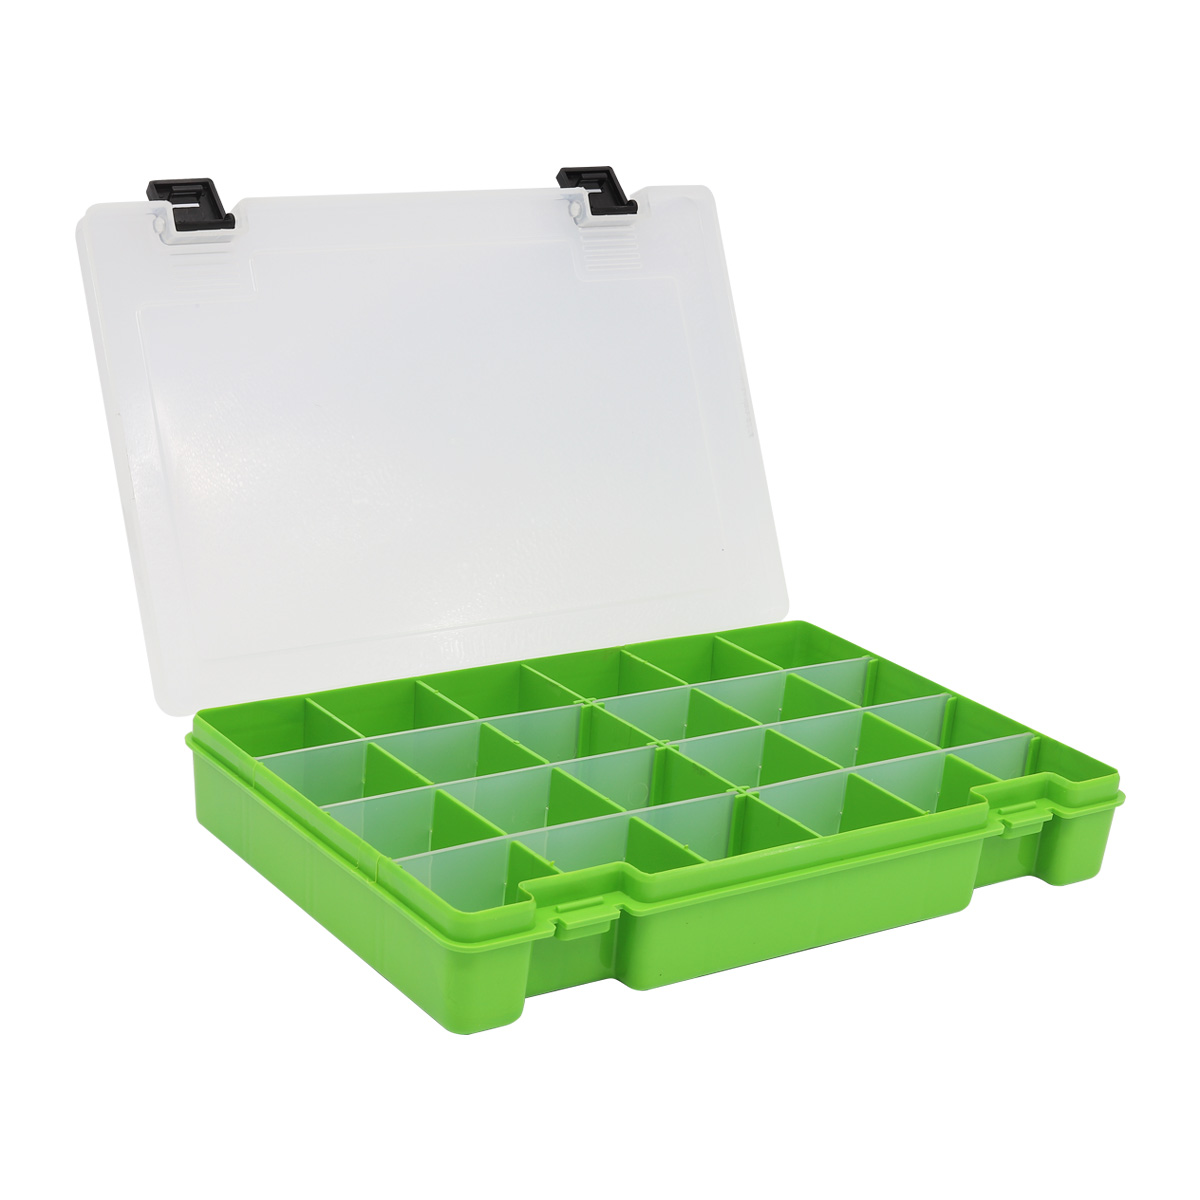 ТИП-7 Коробка, 6 съёмных перегородок, 24 ячейки, 274*188*45 мм (салатовый) TRIVOL